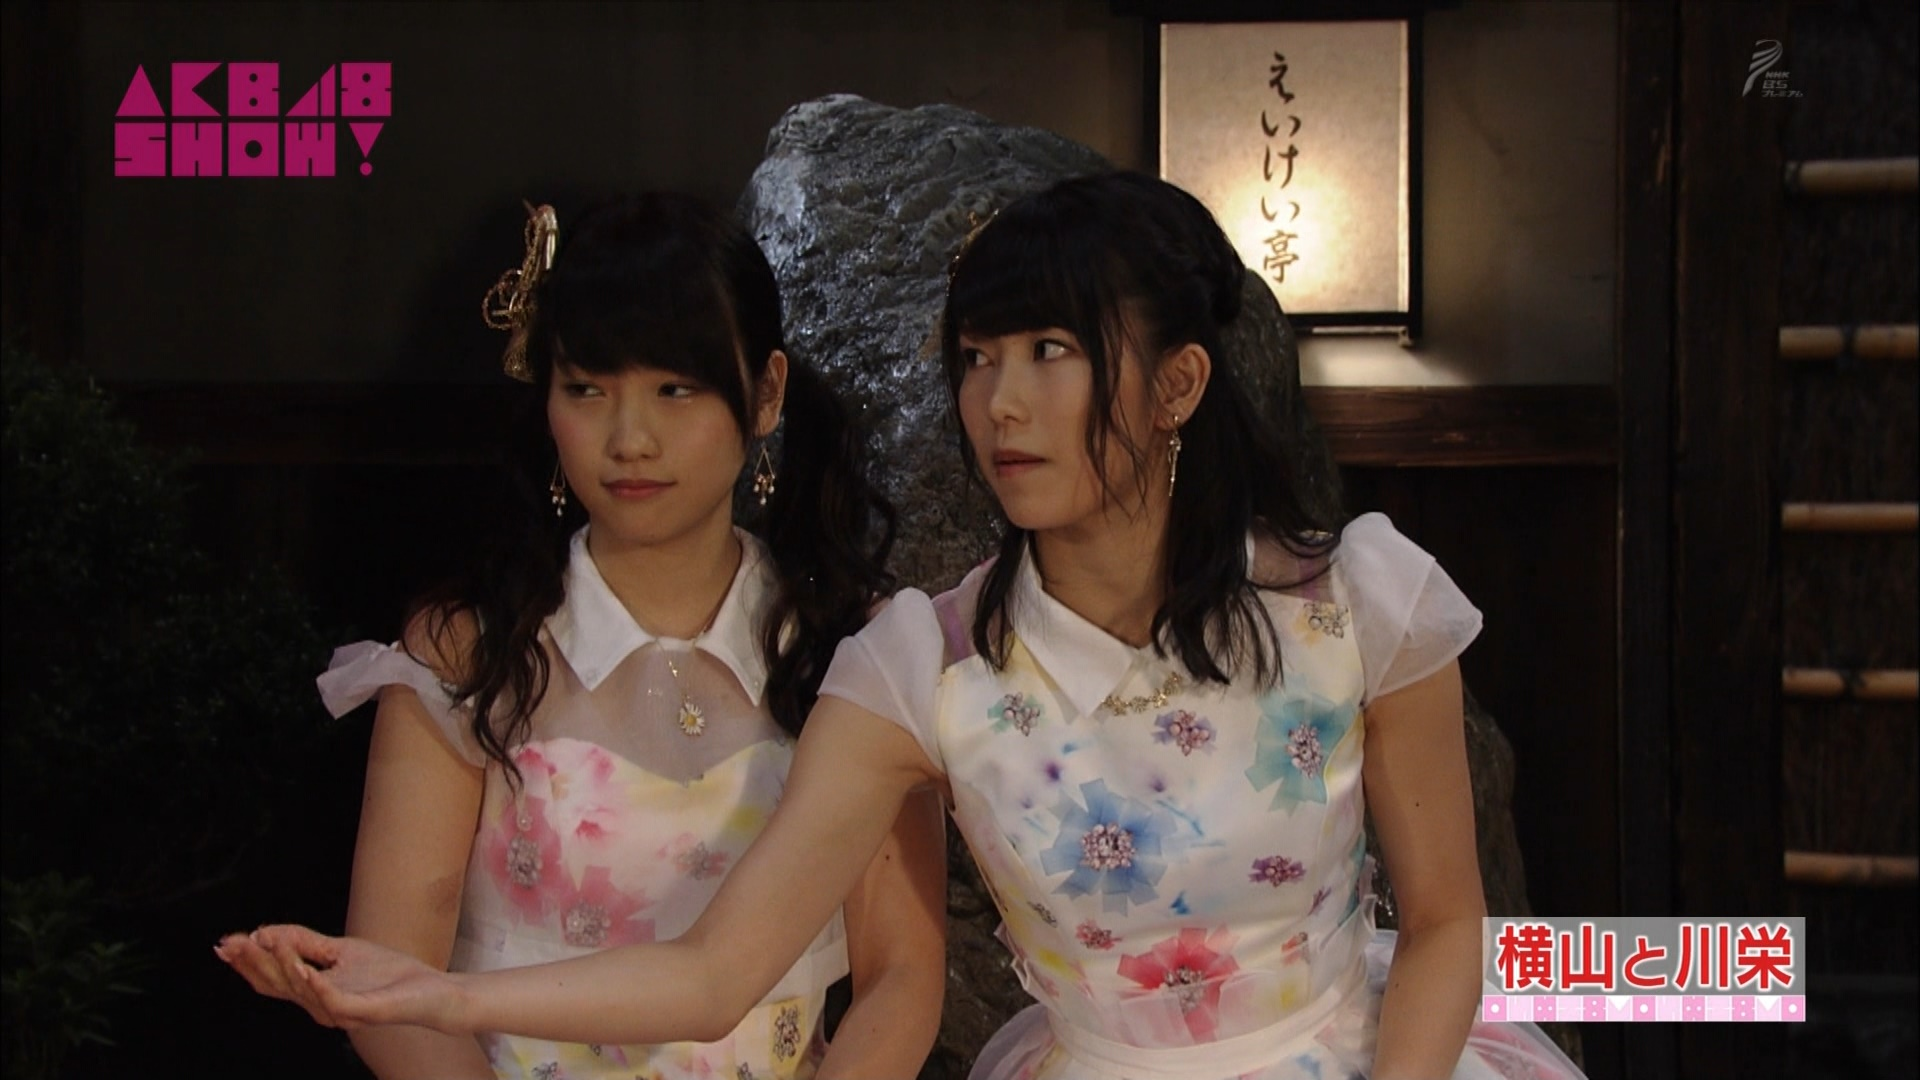 横山由依と川栄李奈 AKB48SHOW! 20140906 (48)